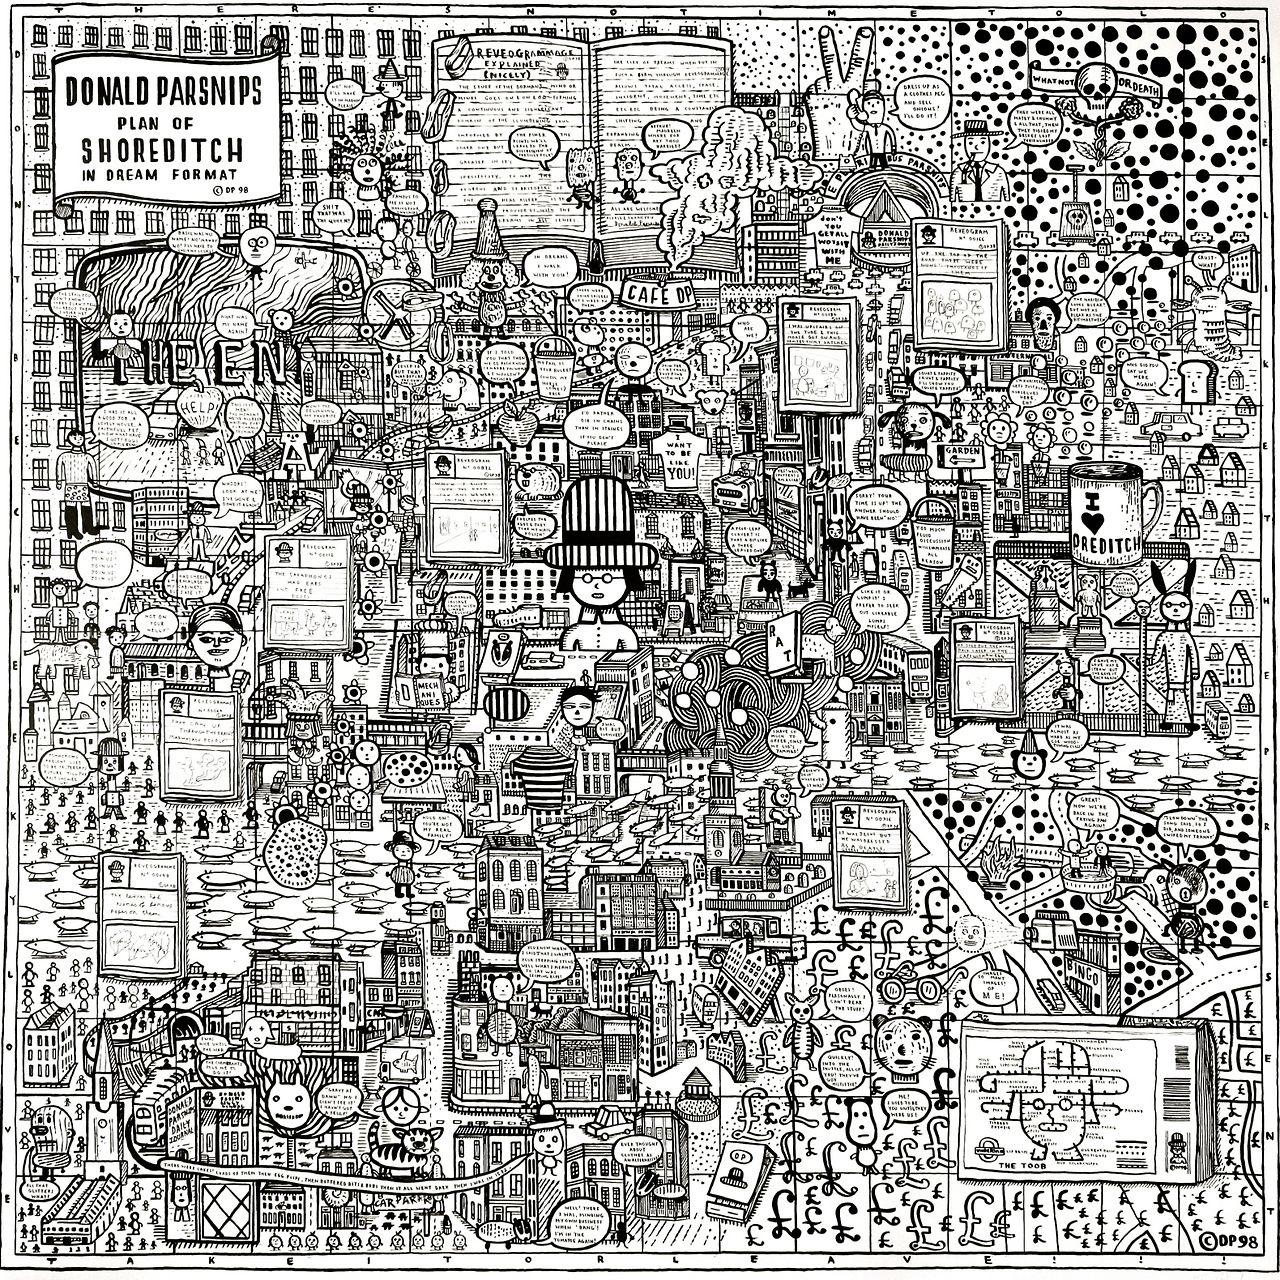 Adam Dant, Plan of Shoreditch, 2012